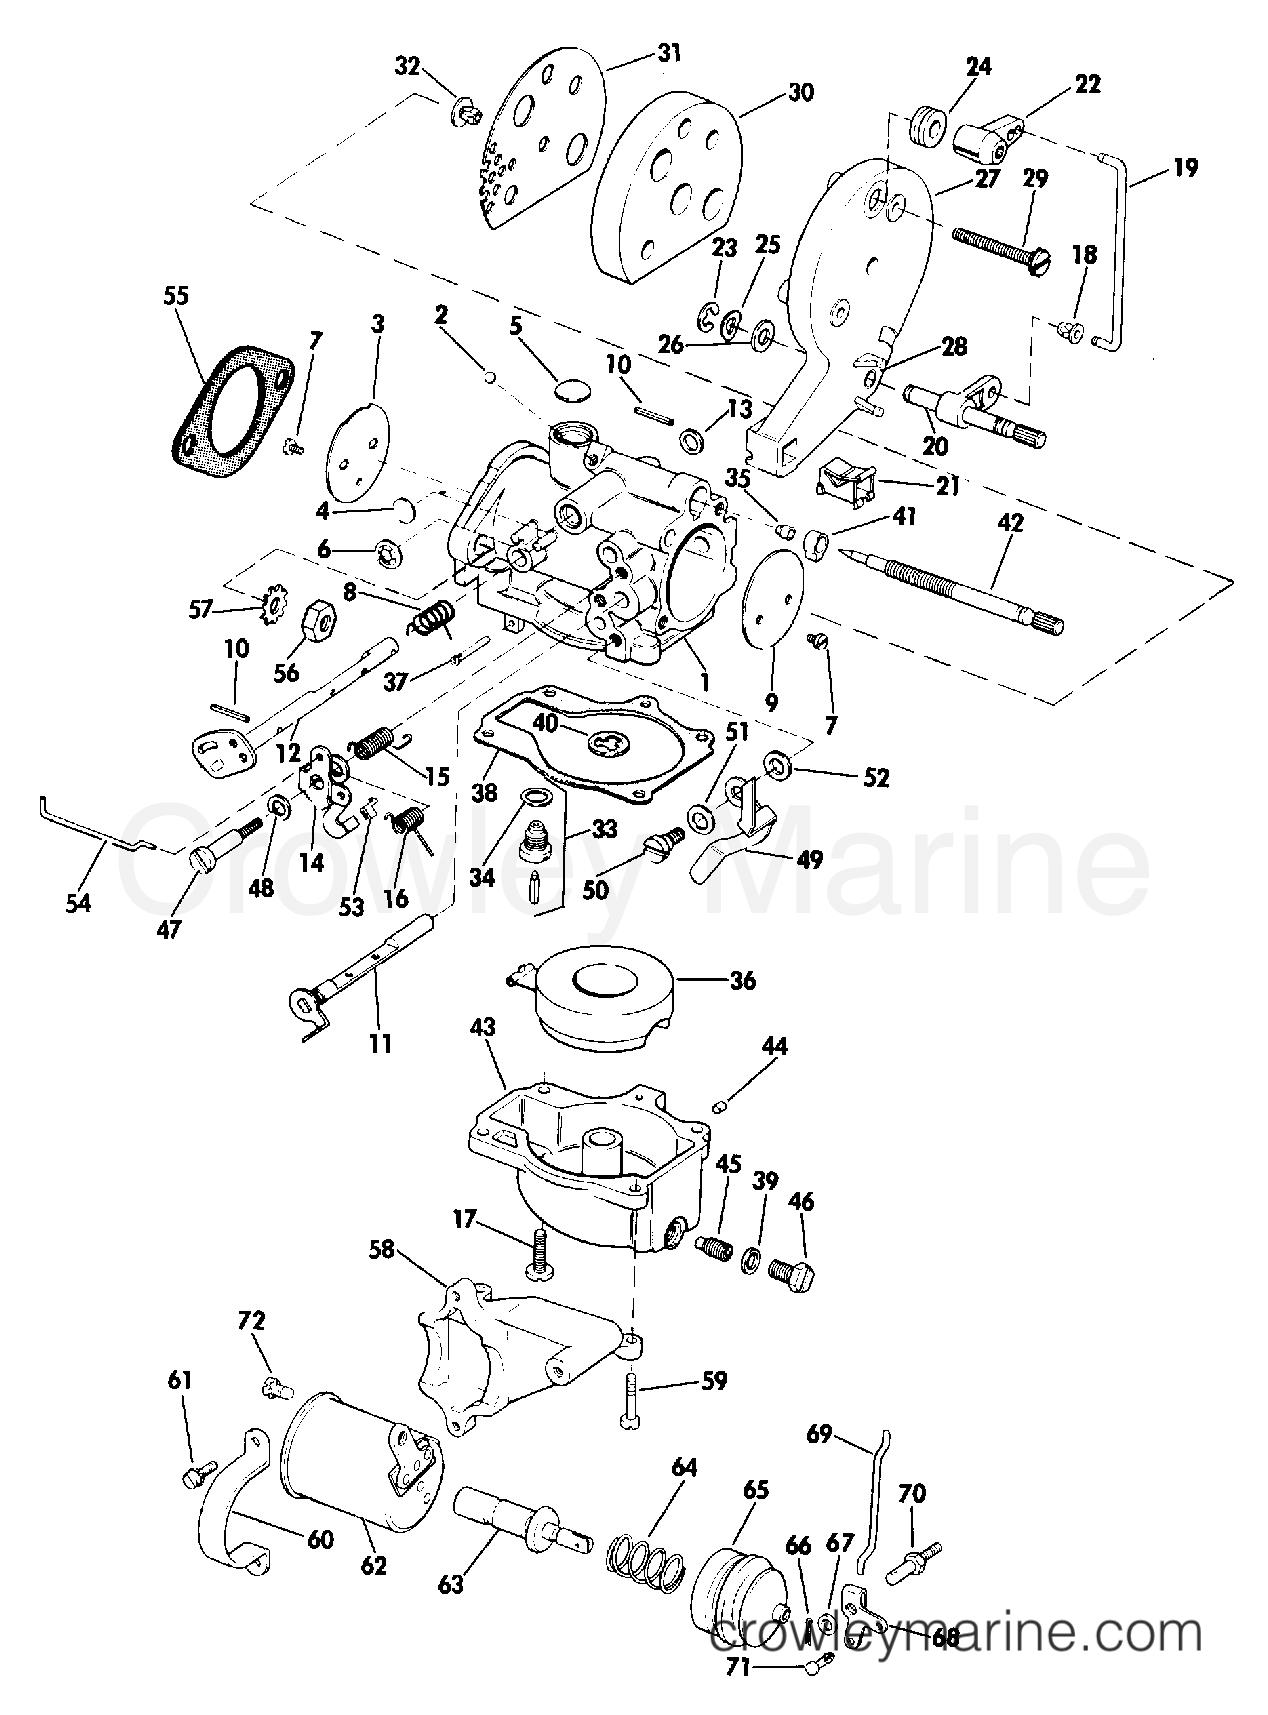 1974 Evinrude Outboards 25 - 25403M - CARBURETOR